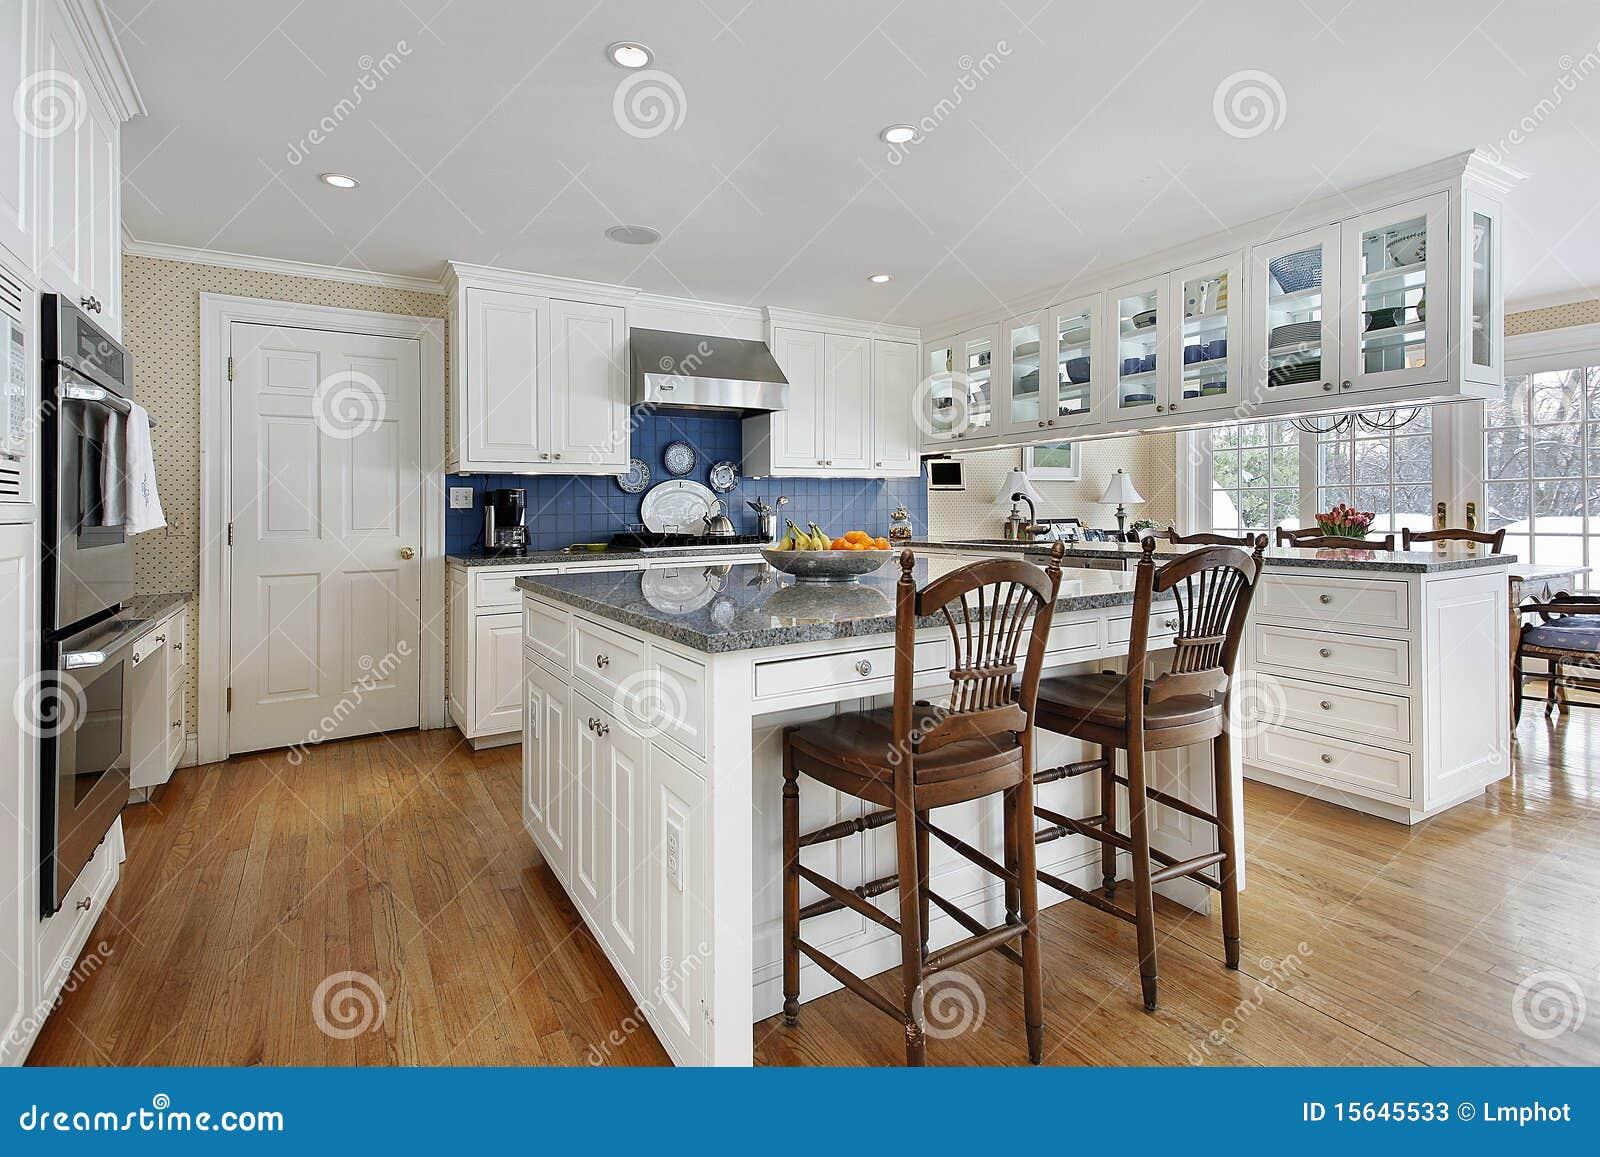 kitchen with large center island stock photos image